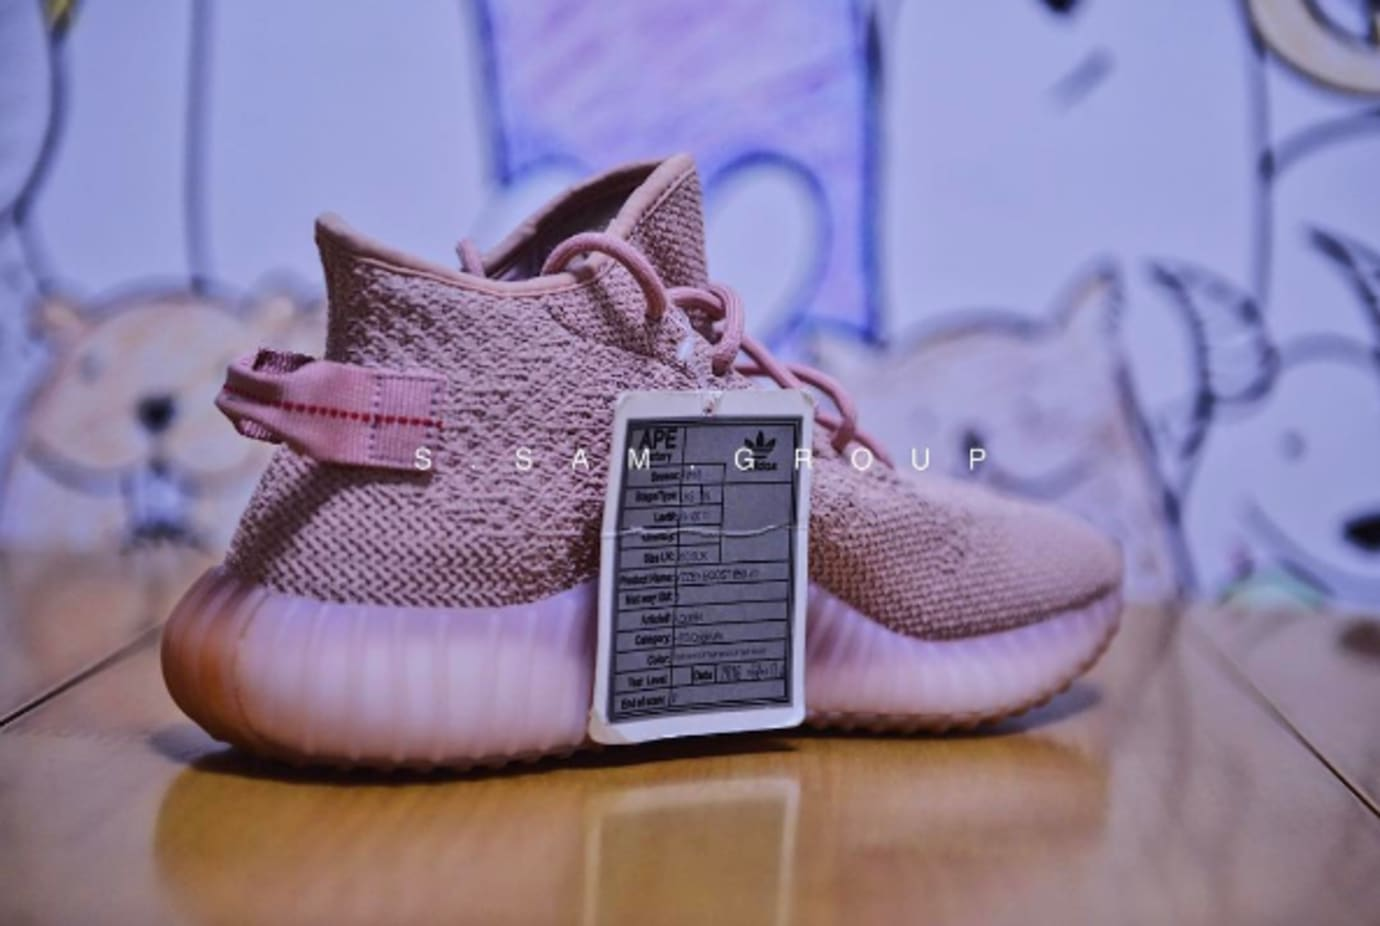 d880bee6553 ... Adidas Yeezy Boost 650 Sample